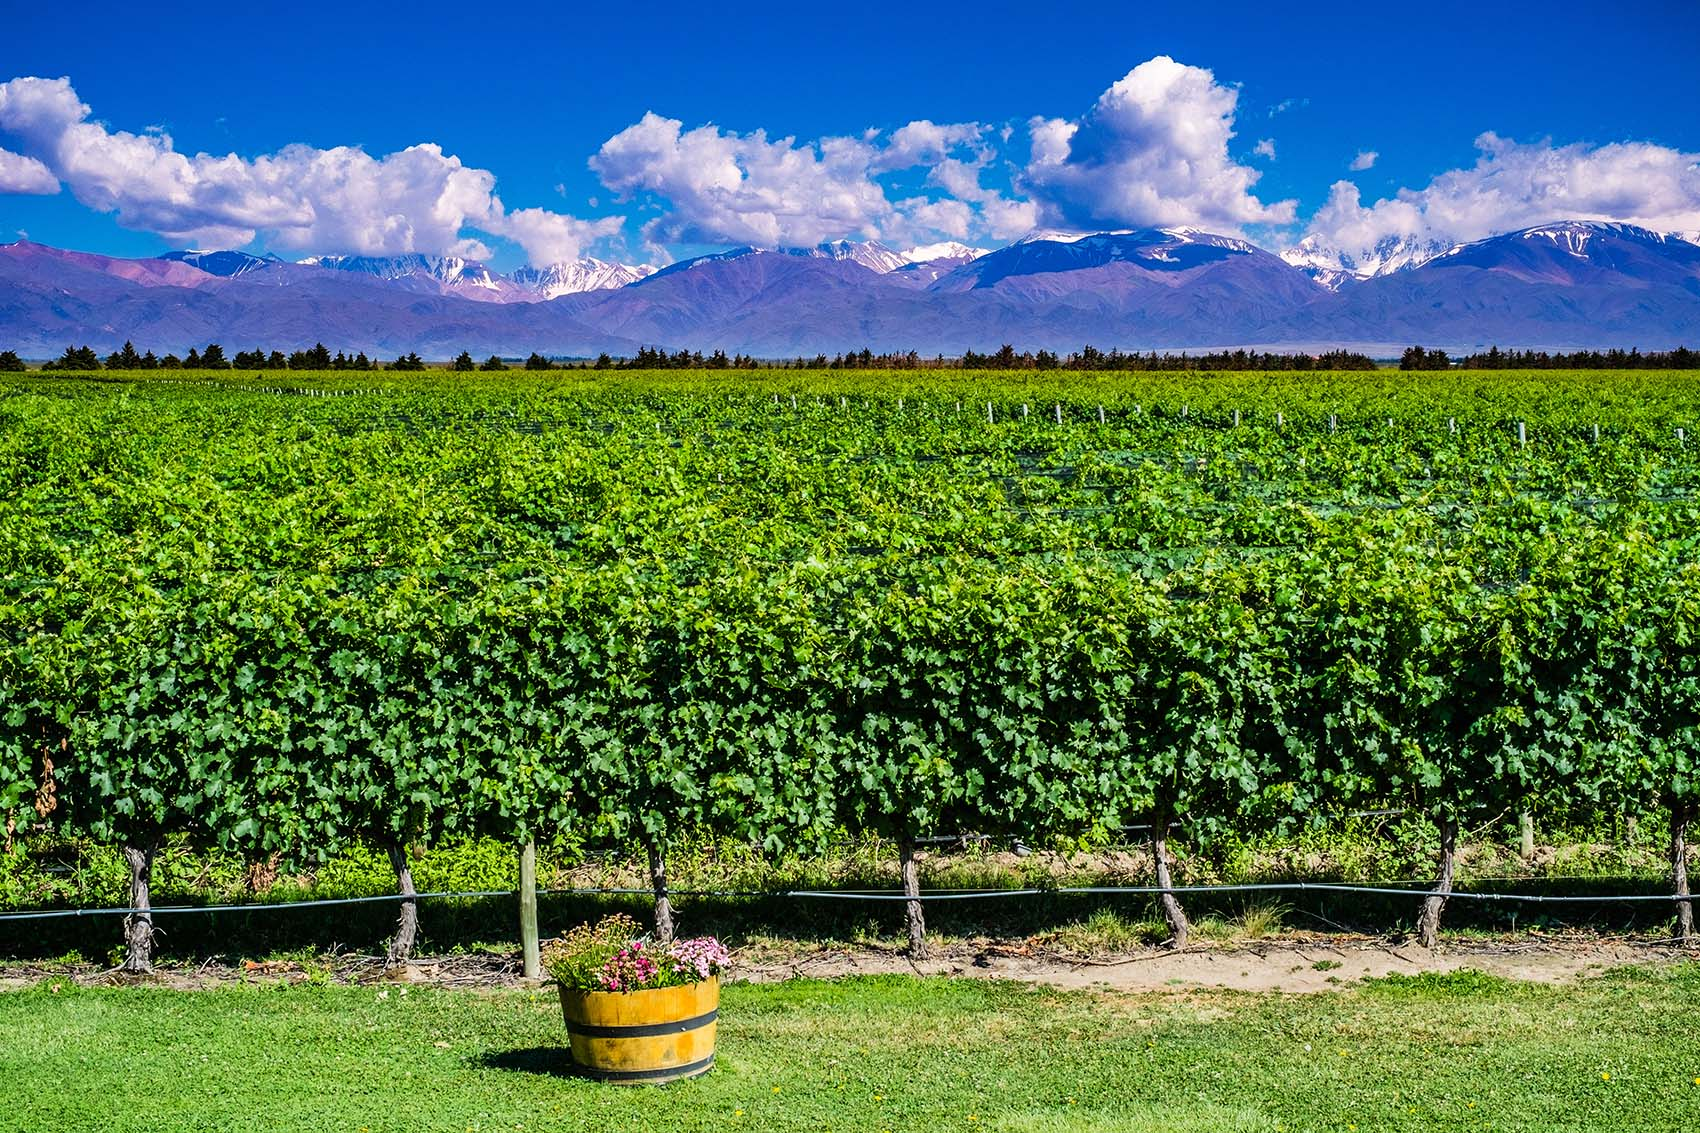 workaway-in-a-vineyard